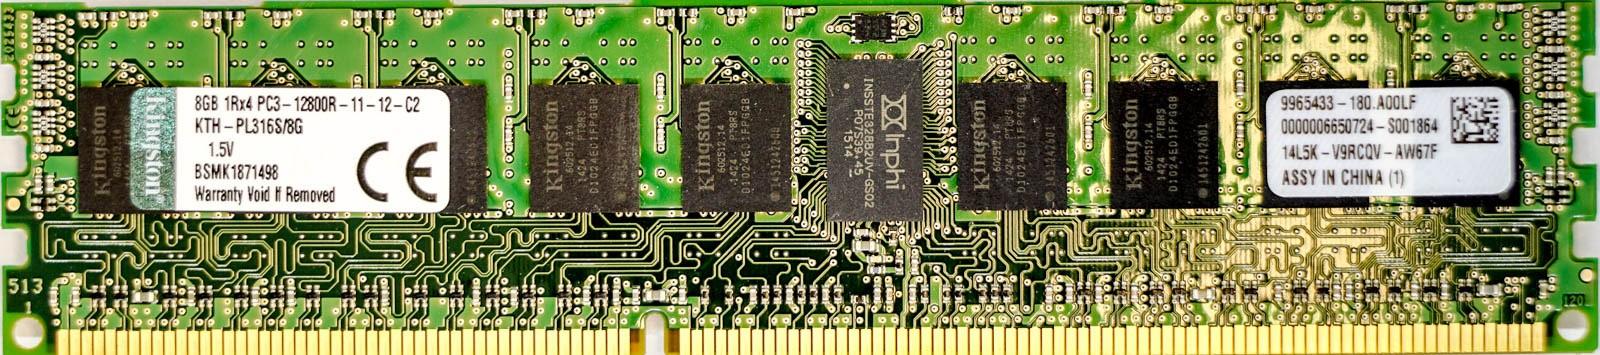 Kingston - 8GB PC3-12800R (DDR3-1600Mhz, 1RX4)